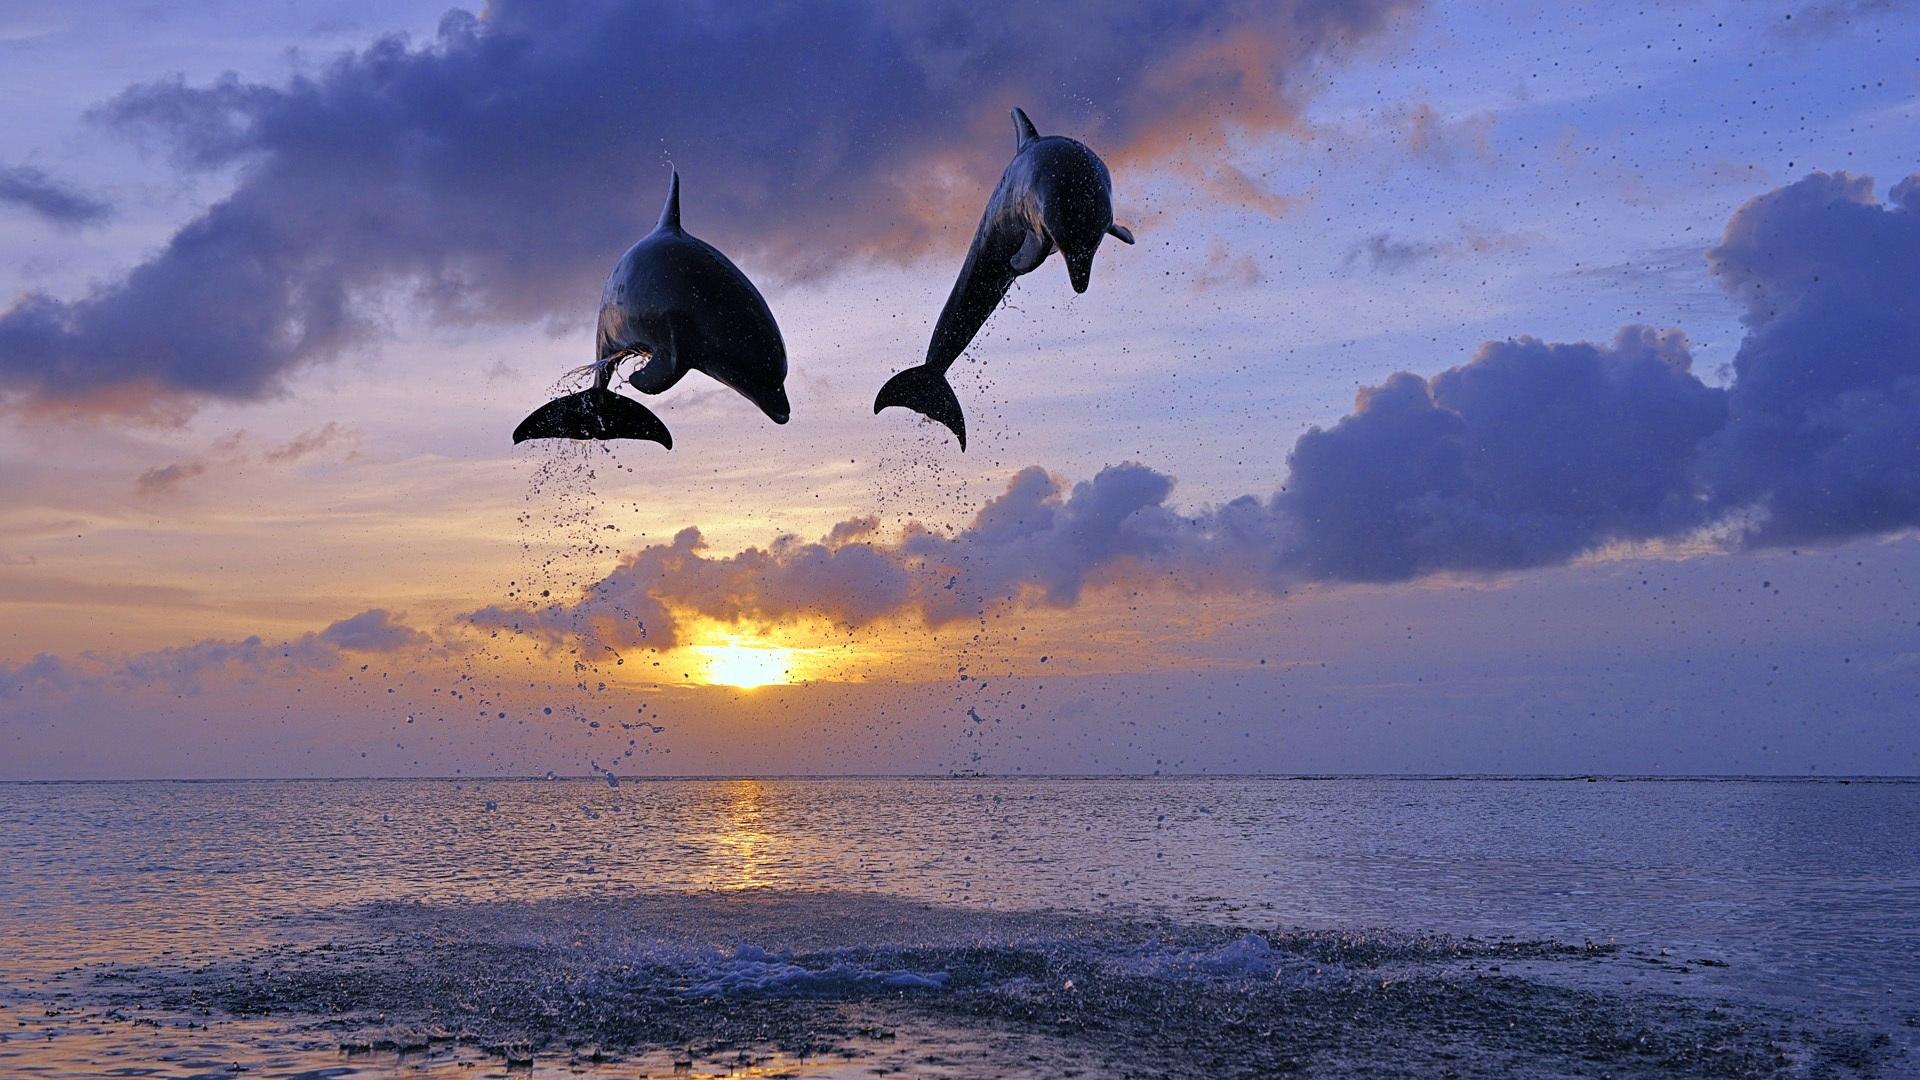 картинки дельфины море солнце комиксах гвен